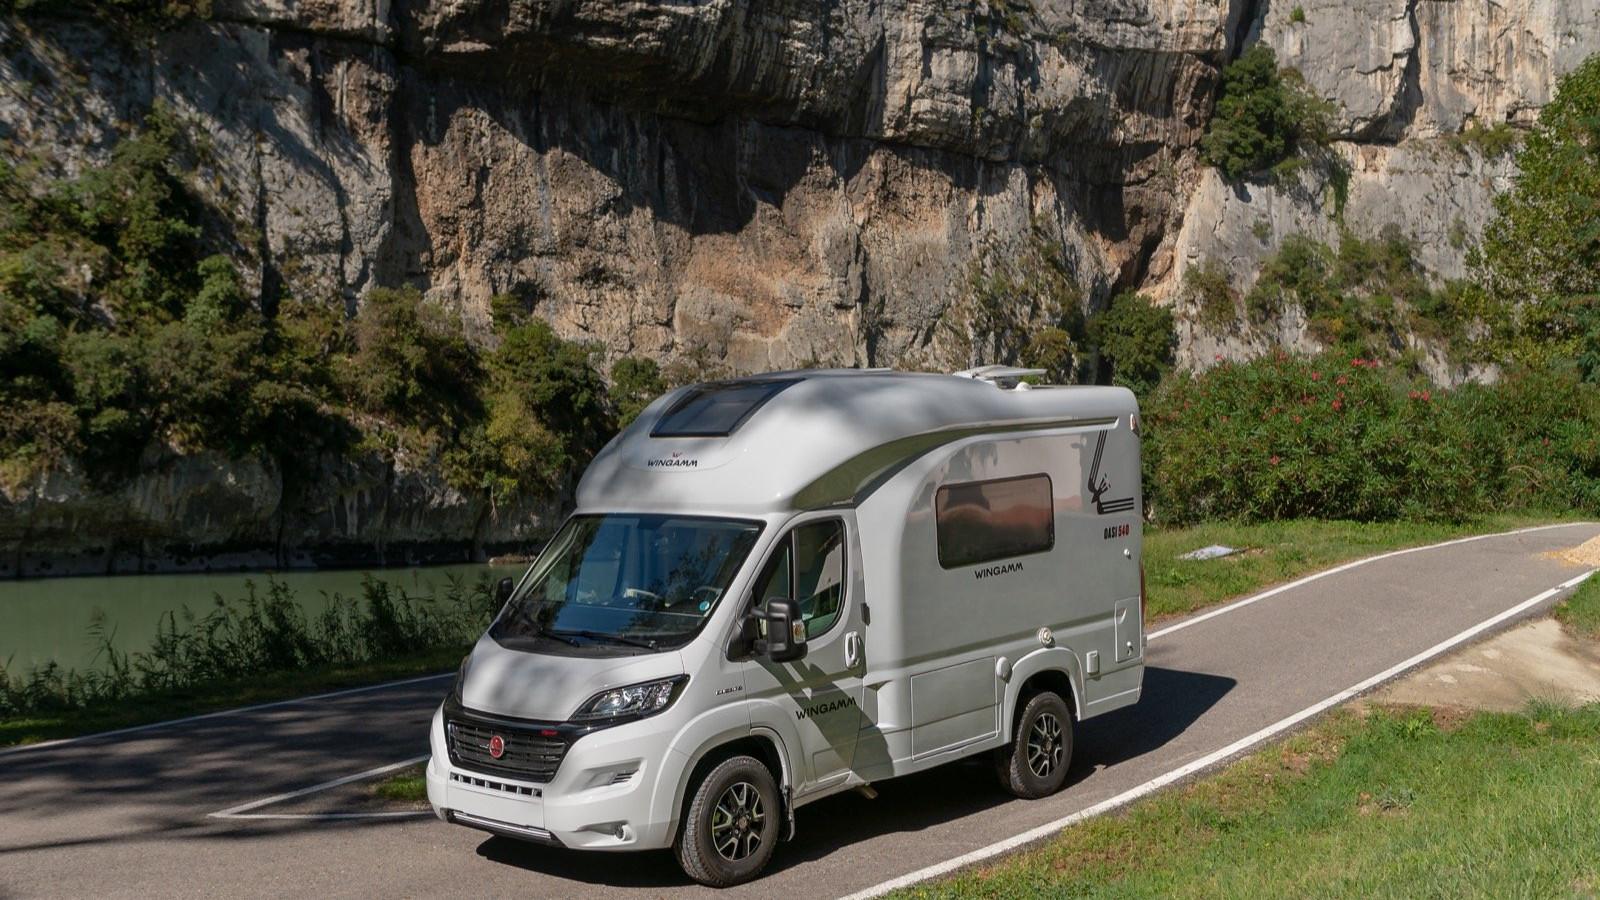 Oasi 540 - petit camping-car de luxe compact de moins de 5 6m - camping-car